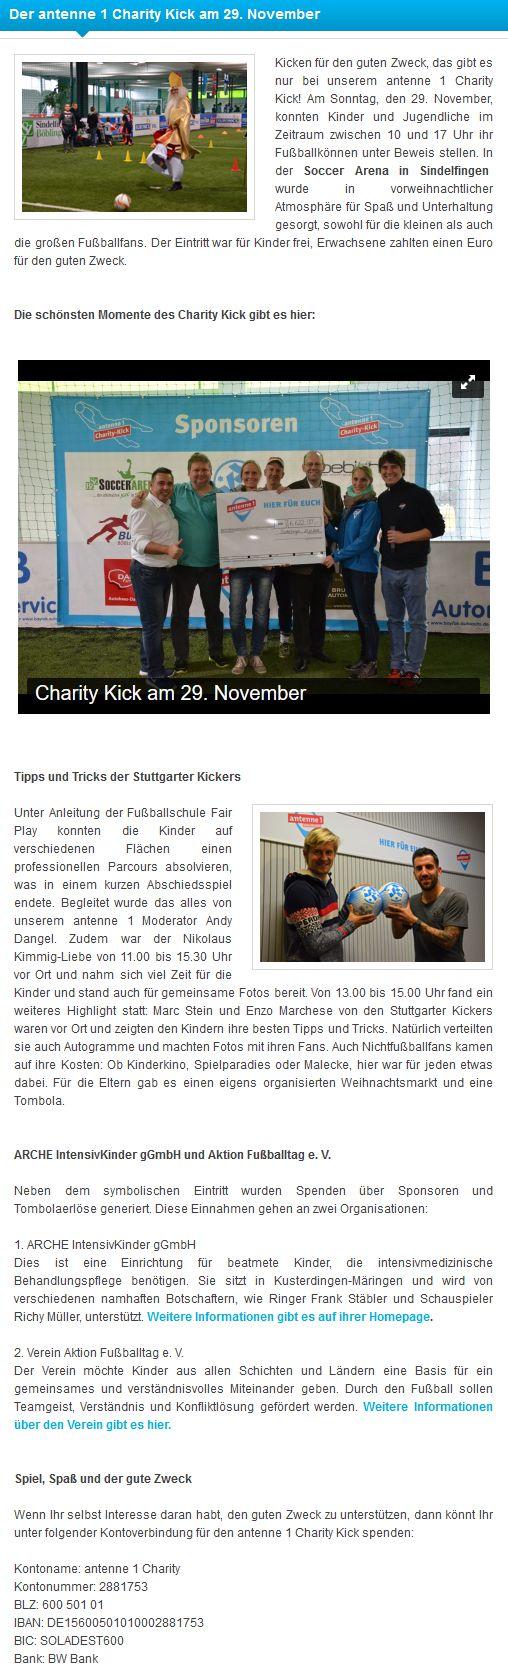 Der antenne1 Charity Kick Rueckblick - Bild 1 - Datum: 03.12.2015 - Tags: Antenne 1, Charity Kick, AKTION FUSSBALLTAG e.V.